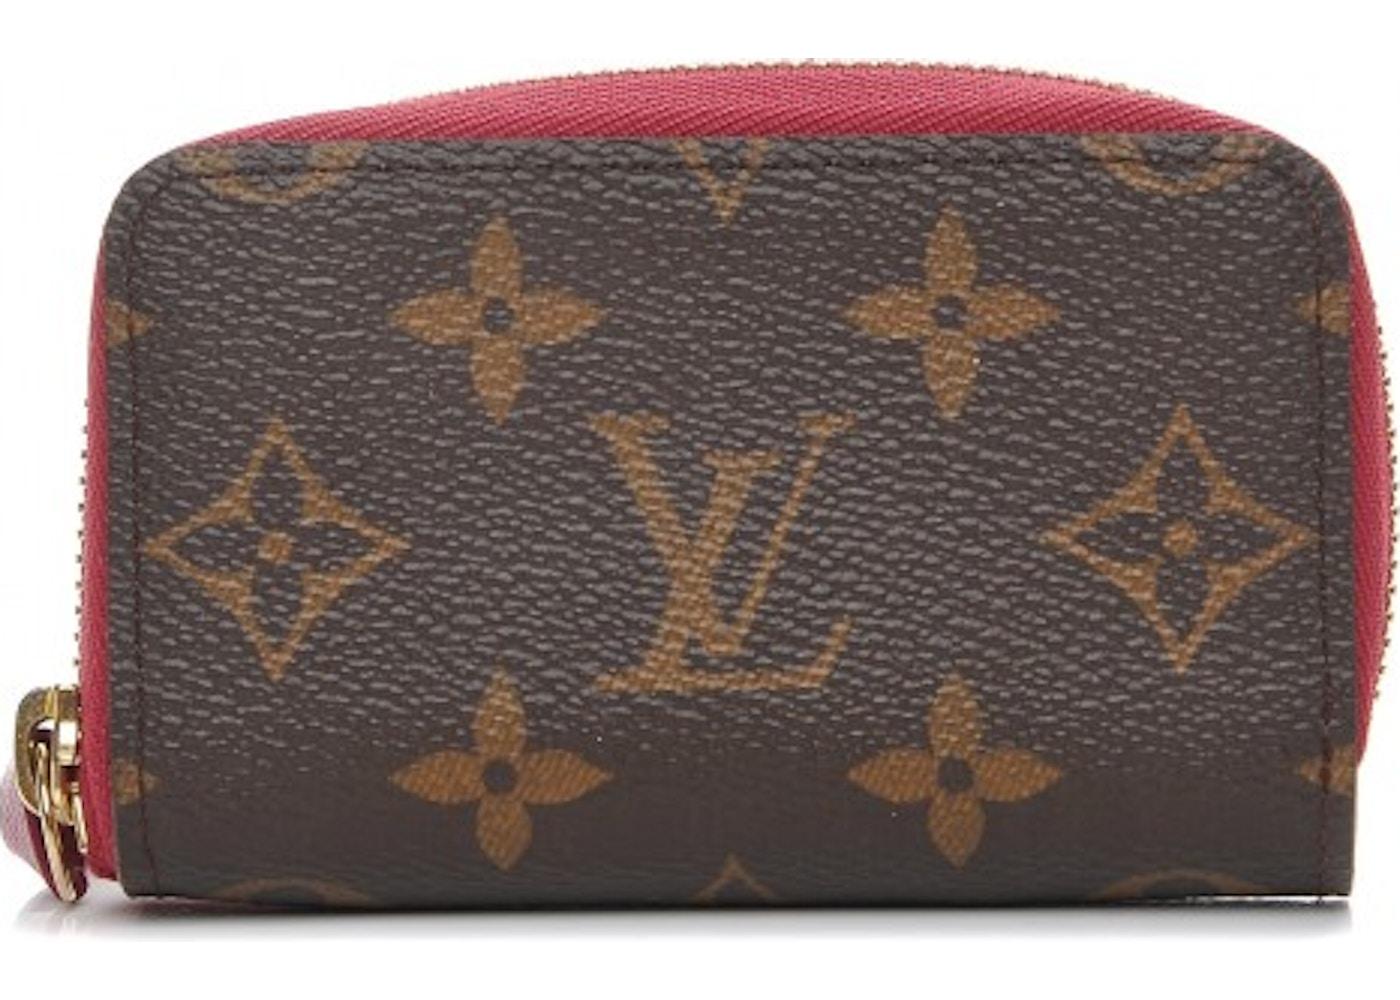 8a5522a8778d Louis Vuitton Zippy Multicartes Monogram. Monogram